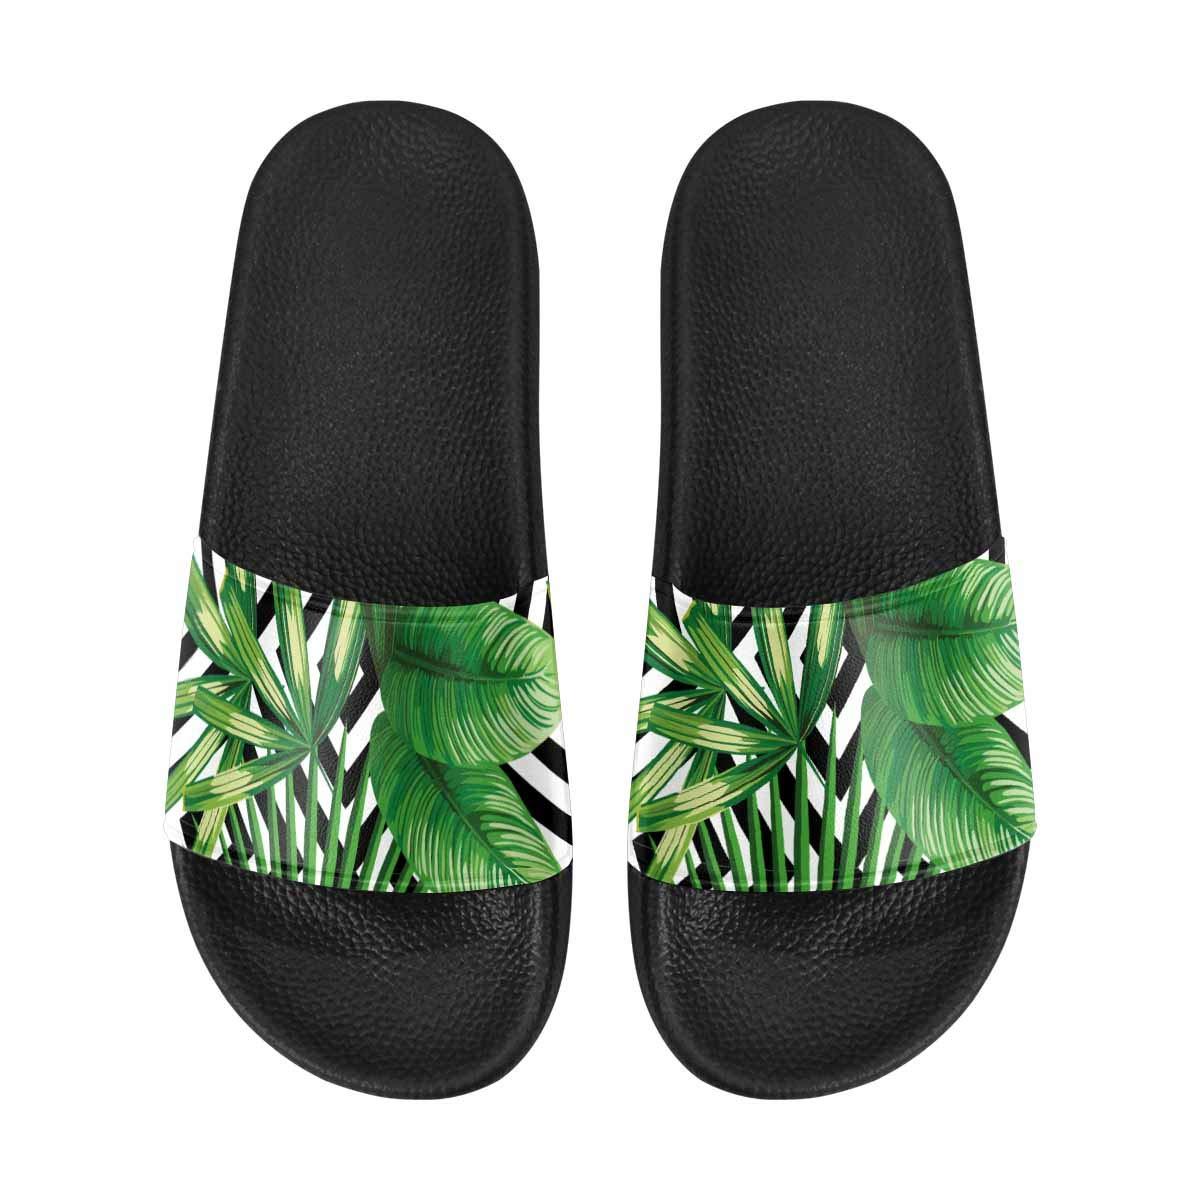 INTERESTPRINT Womens Casual Style Summer Beach Flat Sandals US6-US12